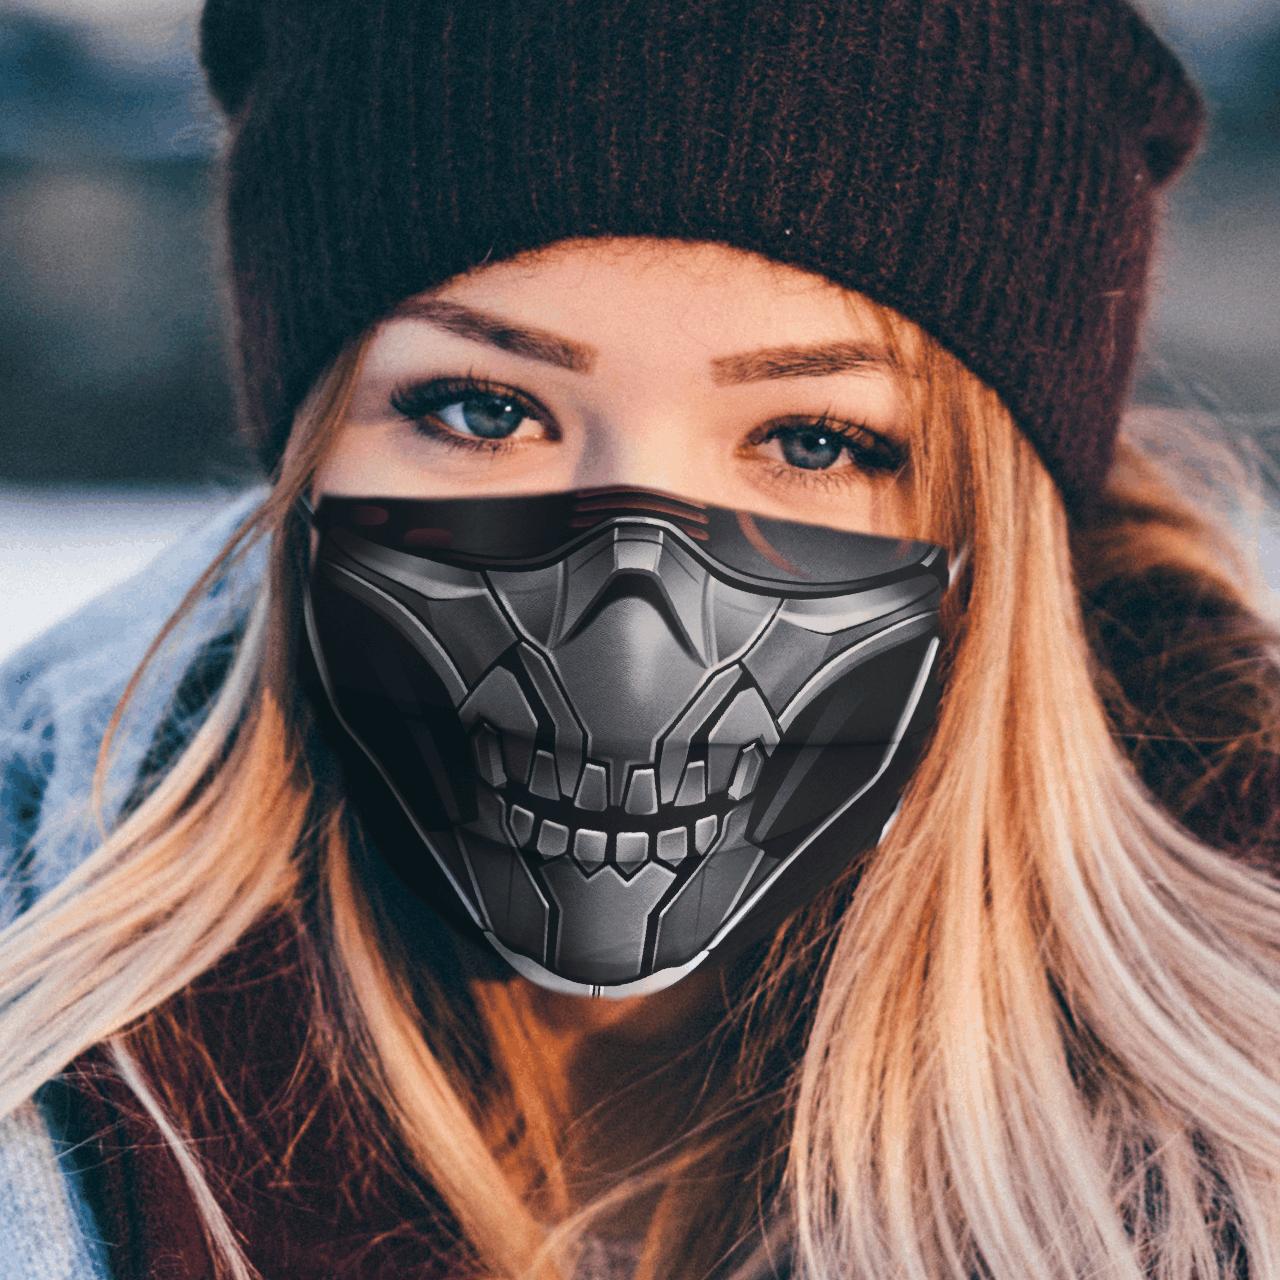 Task Master Face Mask